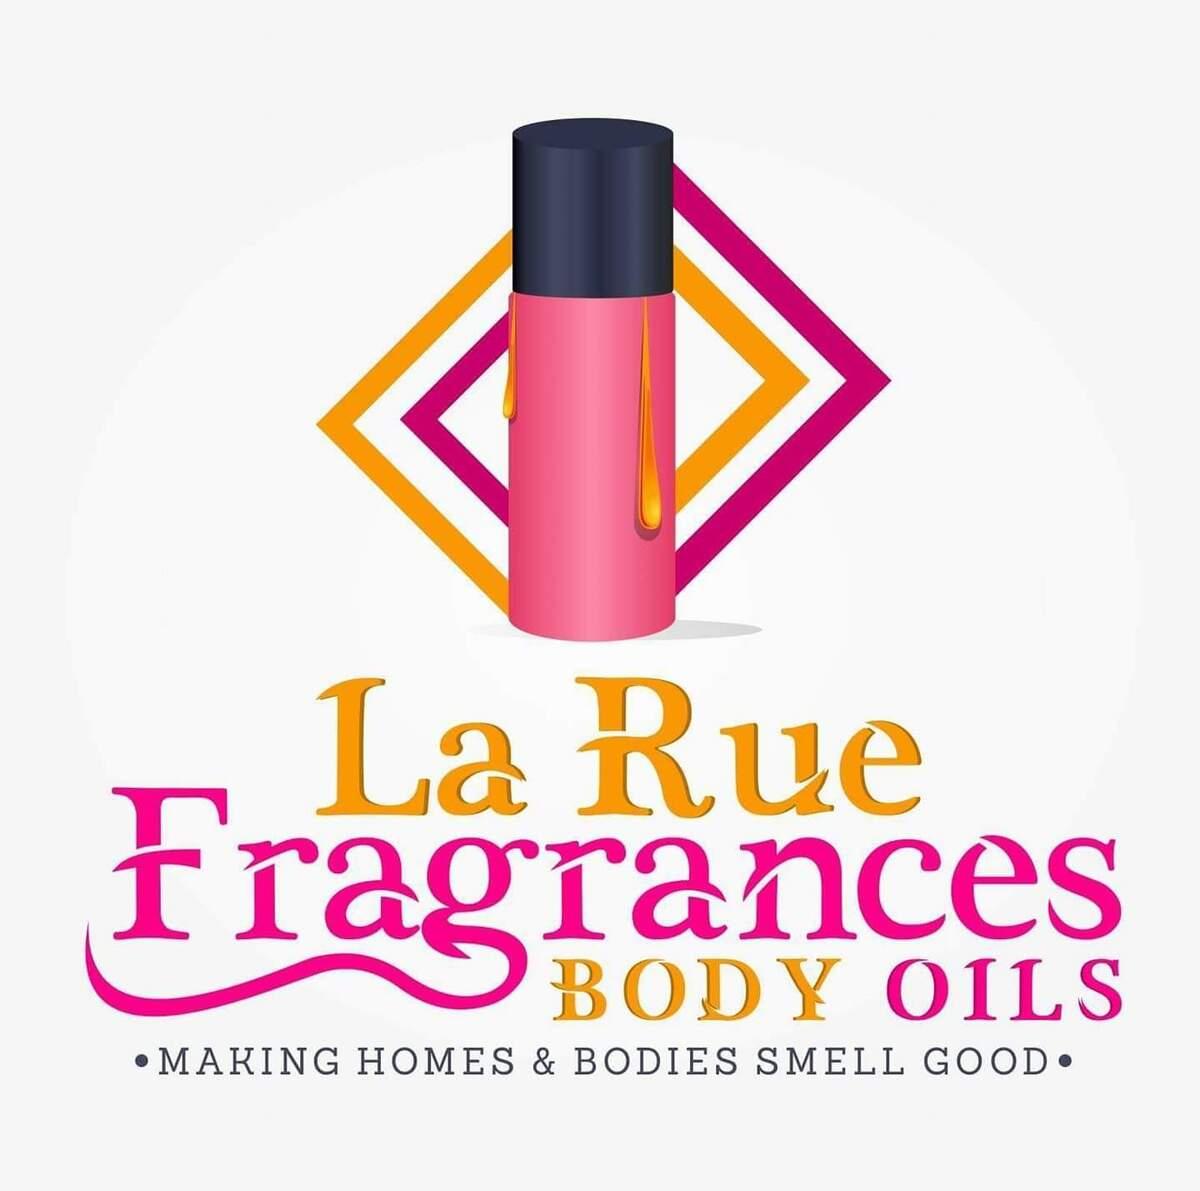 La' Rue Fragrances Body Oils